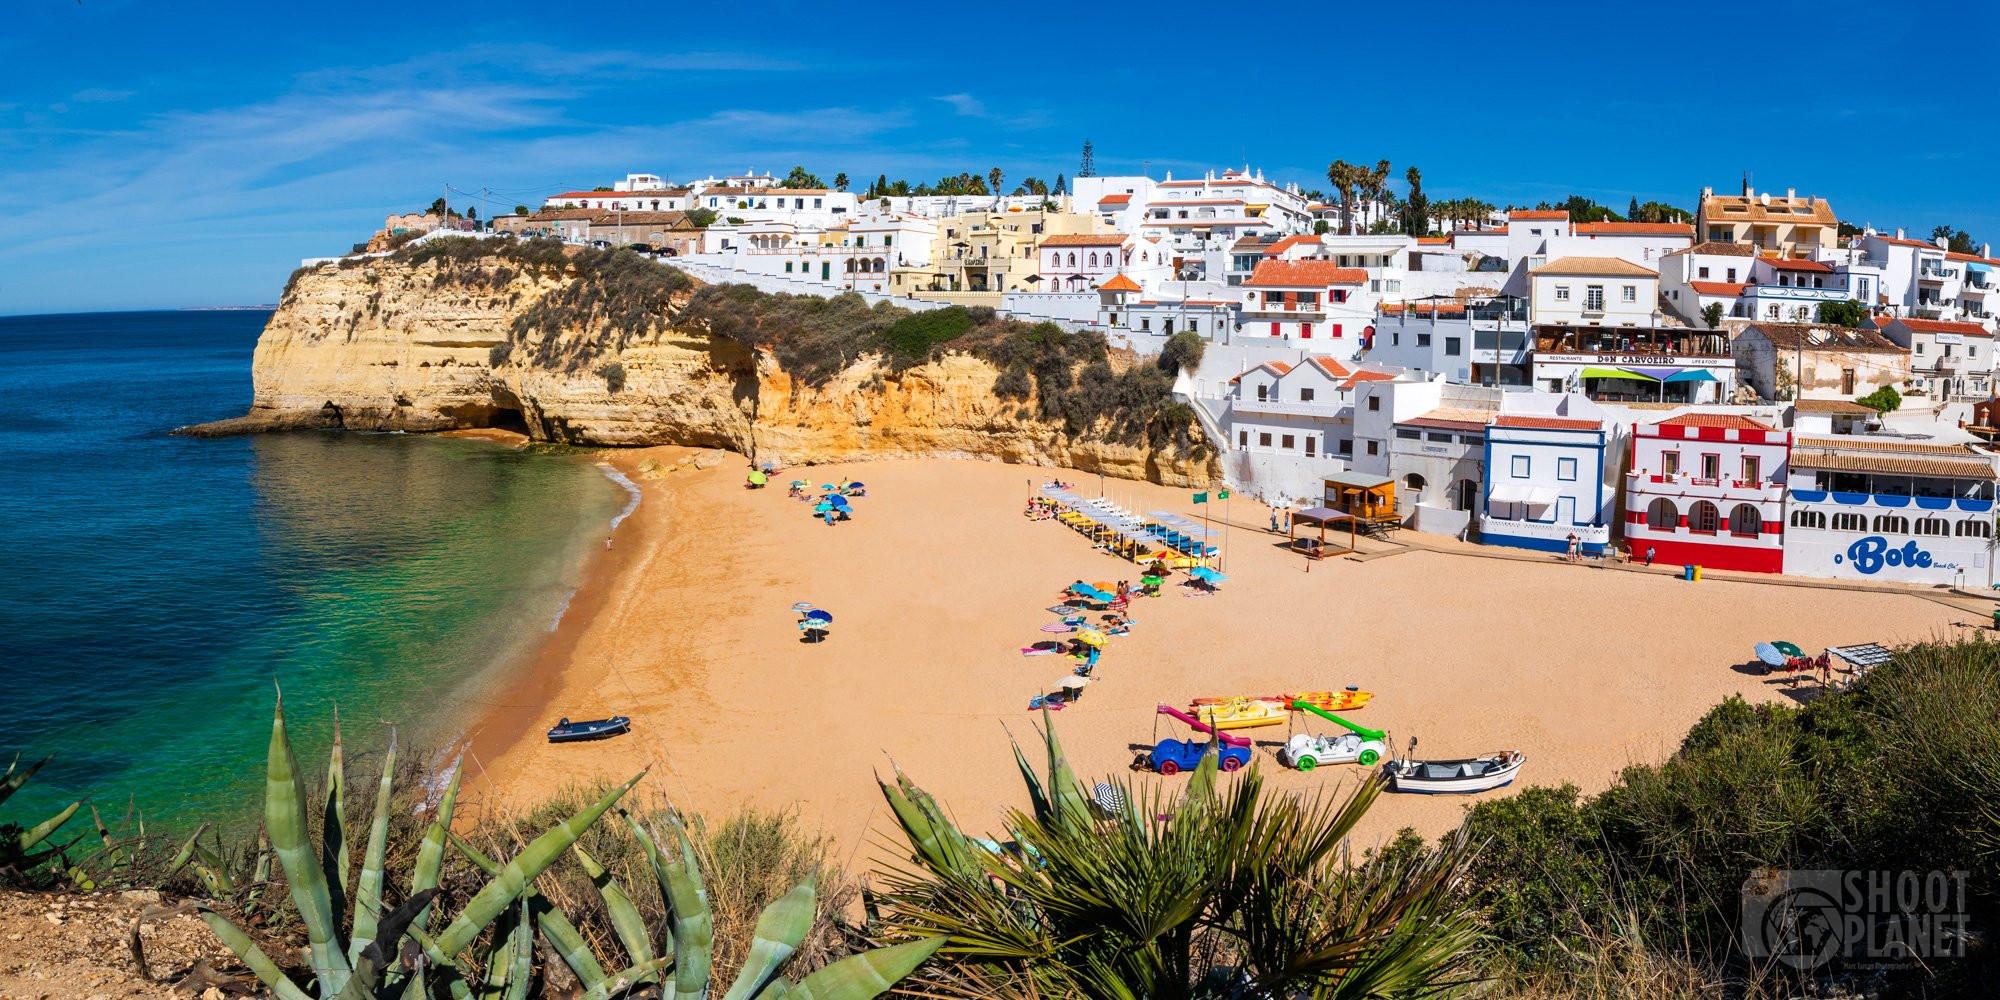 Carvoeiro village and beach, Algarve Portugal